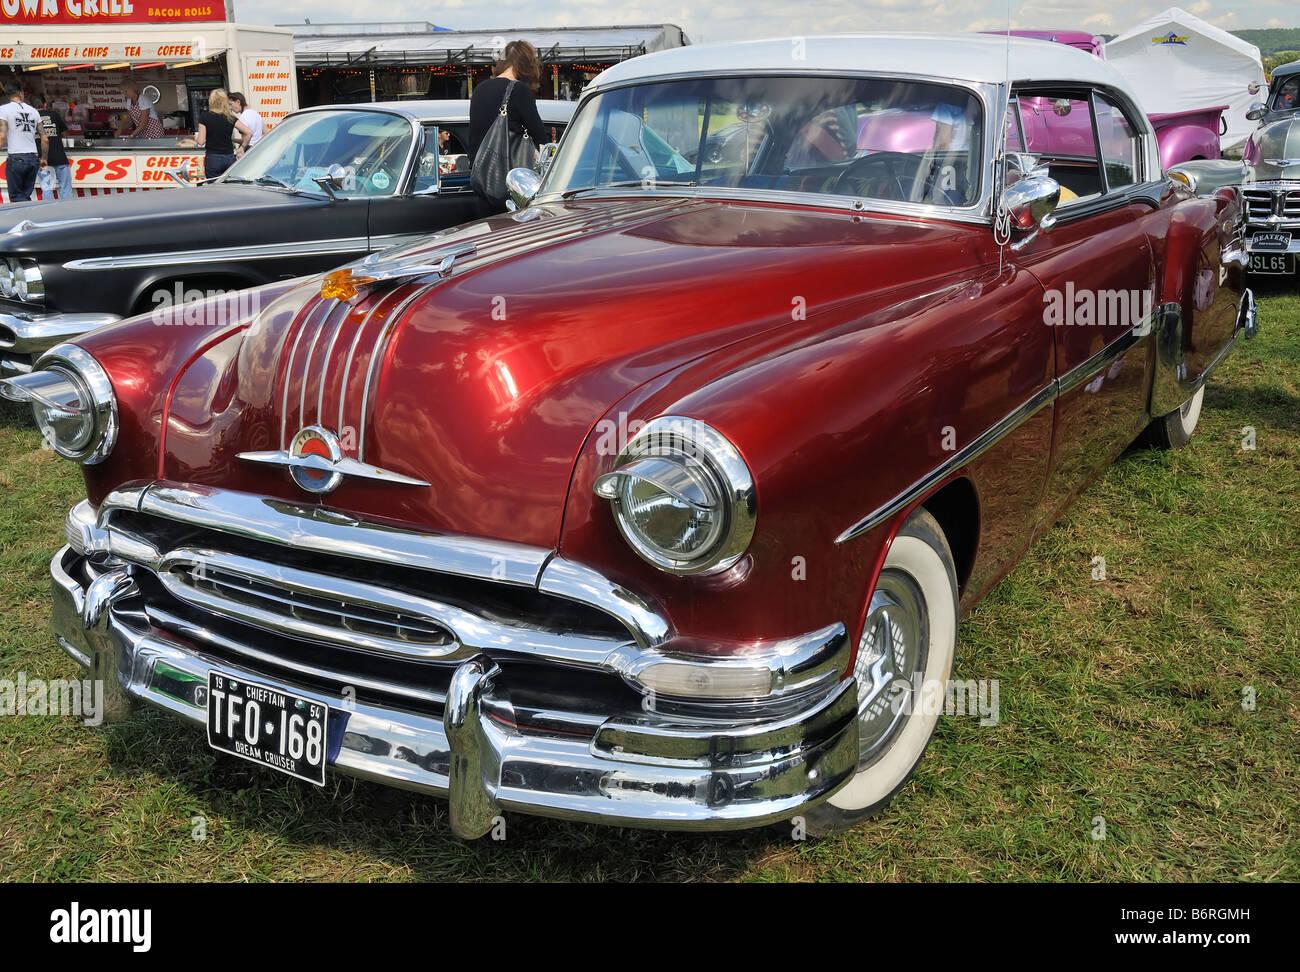 1954 Pontiac Chieftain With 1959 Desoto Fireflite And